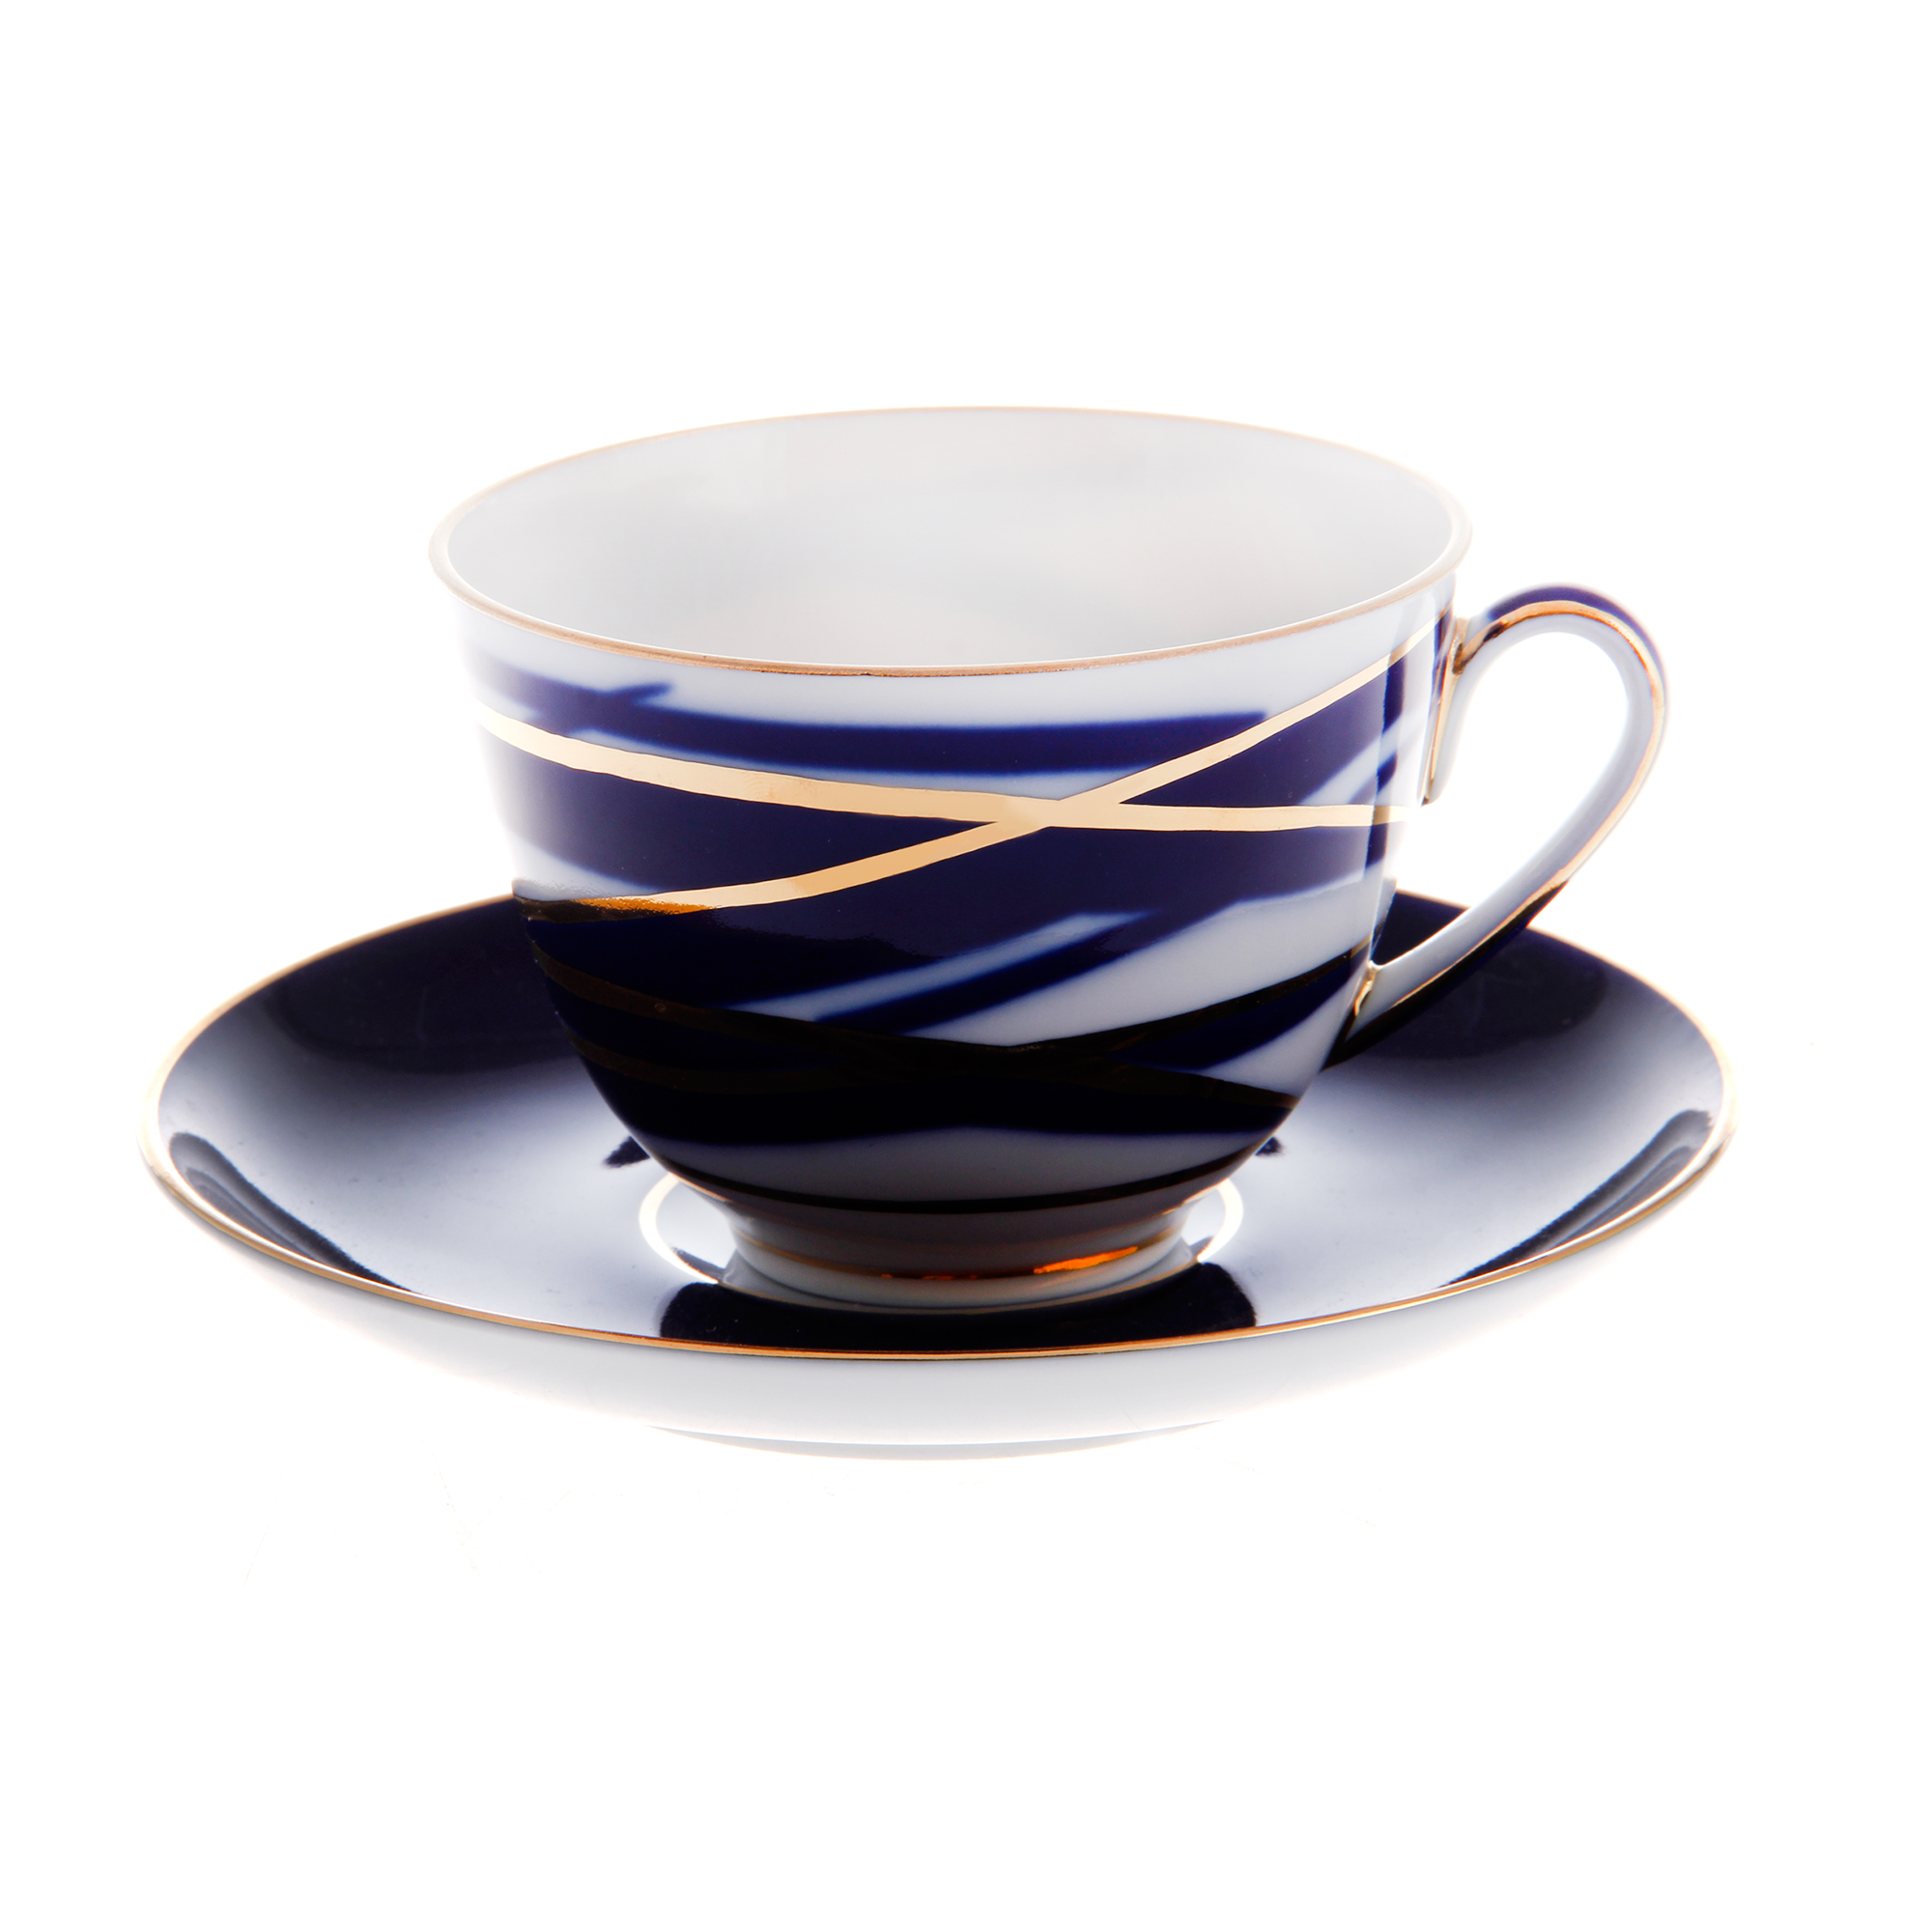 Чашка с блюдцем ЛФЗ чайная, форма весенняя - кокон фото